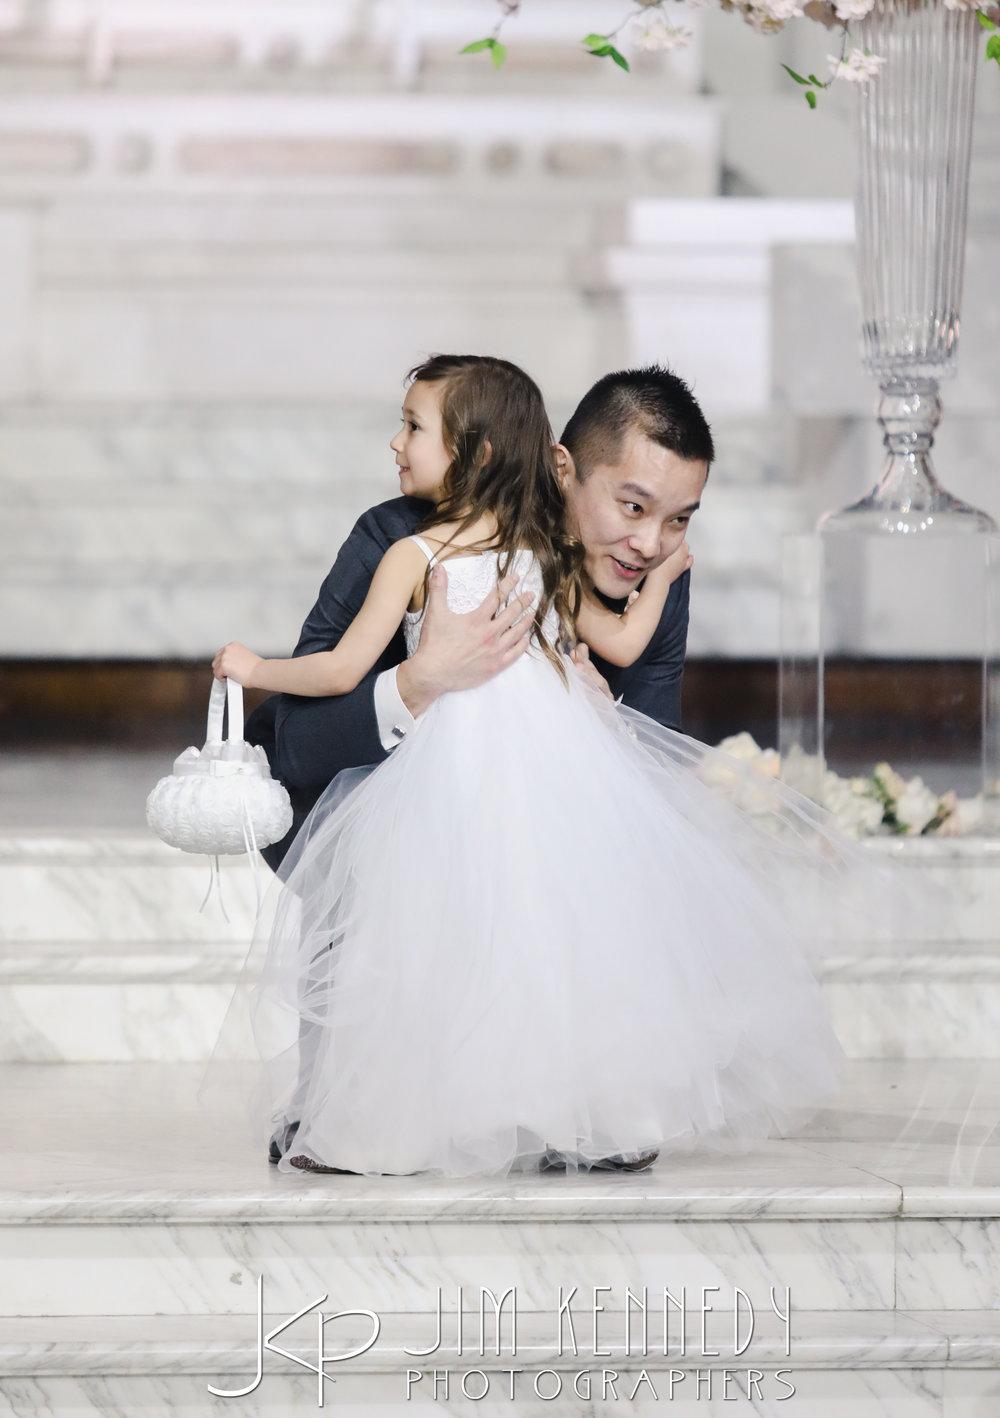 vibian-wedding-los-angeles-katherine-brian_0124.JPG